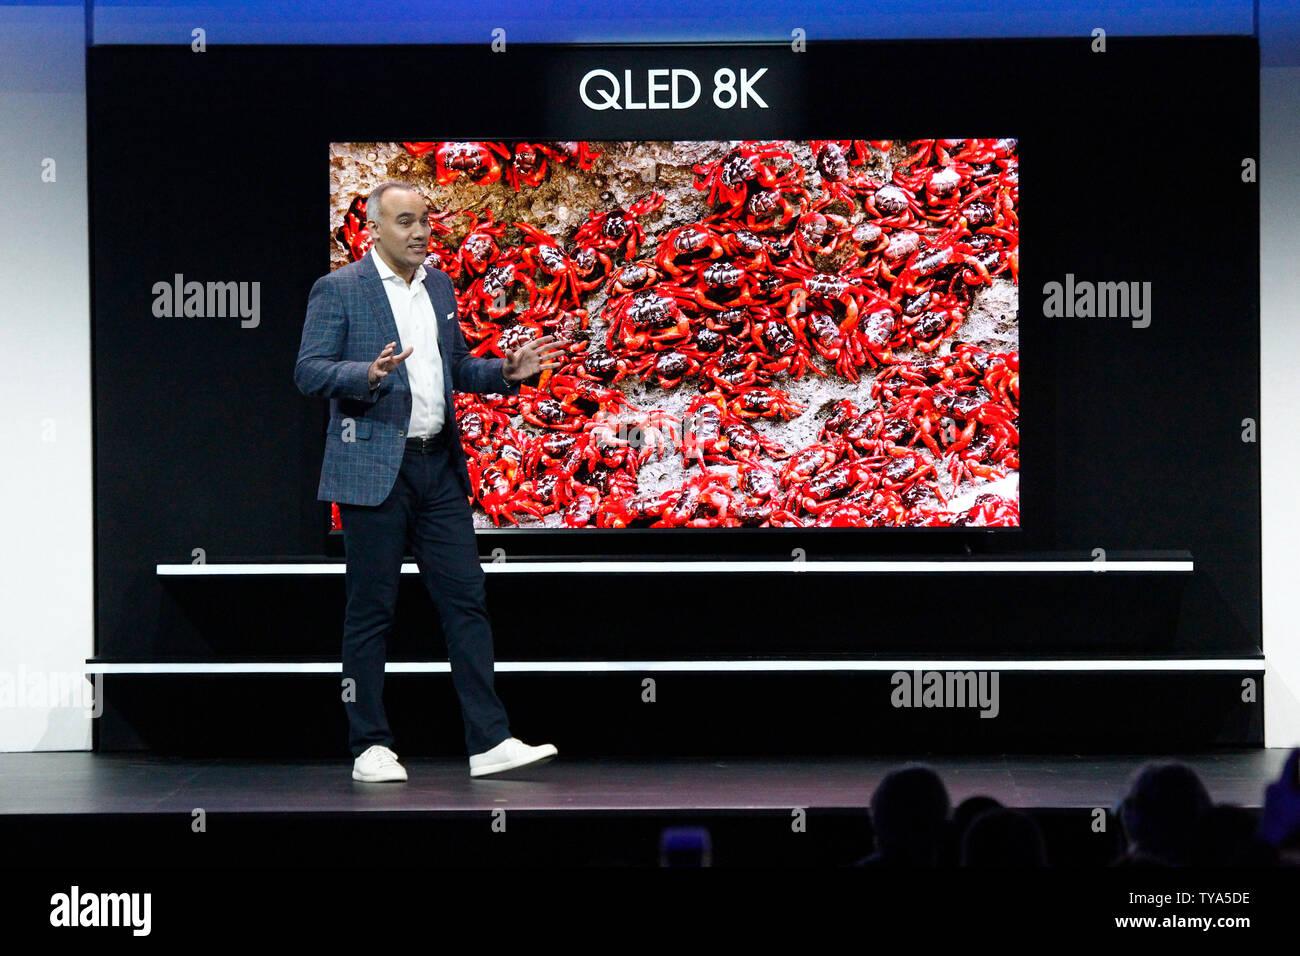 Samsung 8k Qled Television Stock Photos & Samsung 8k Qled